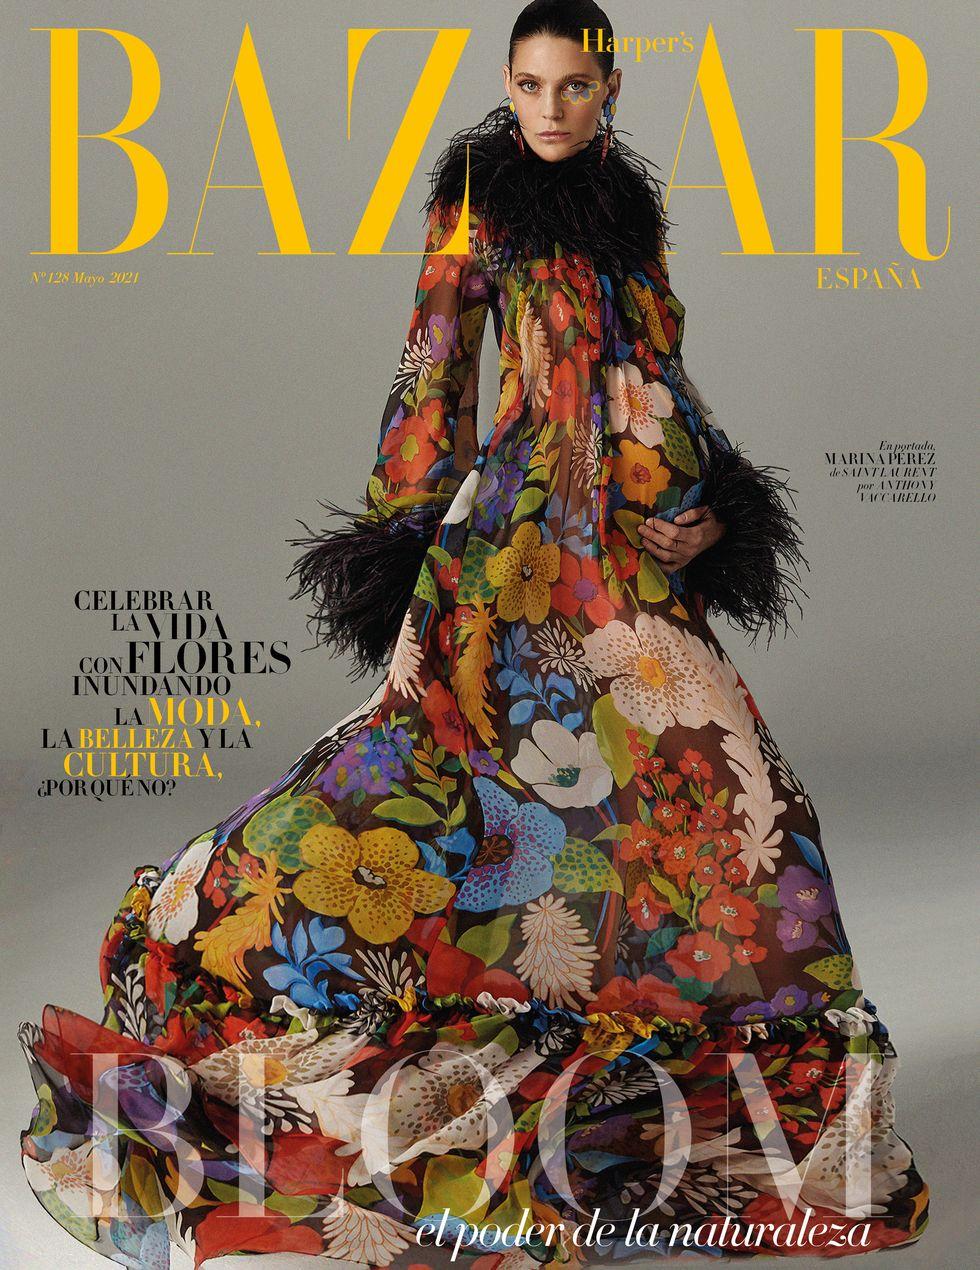 Marina Pérez, embarazada, portada de mayo de Harper's Bazaar